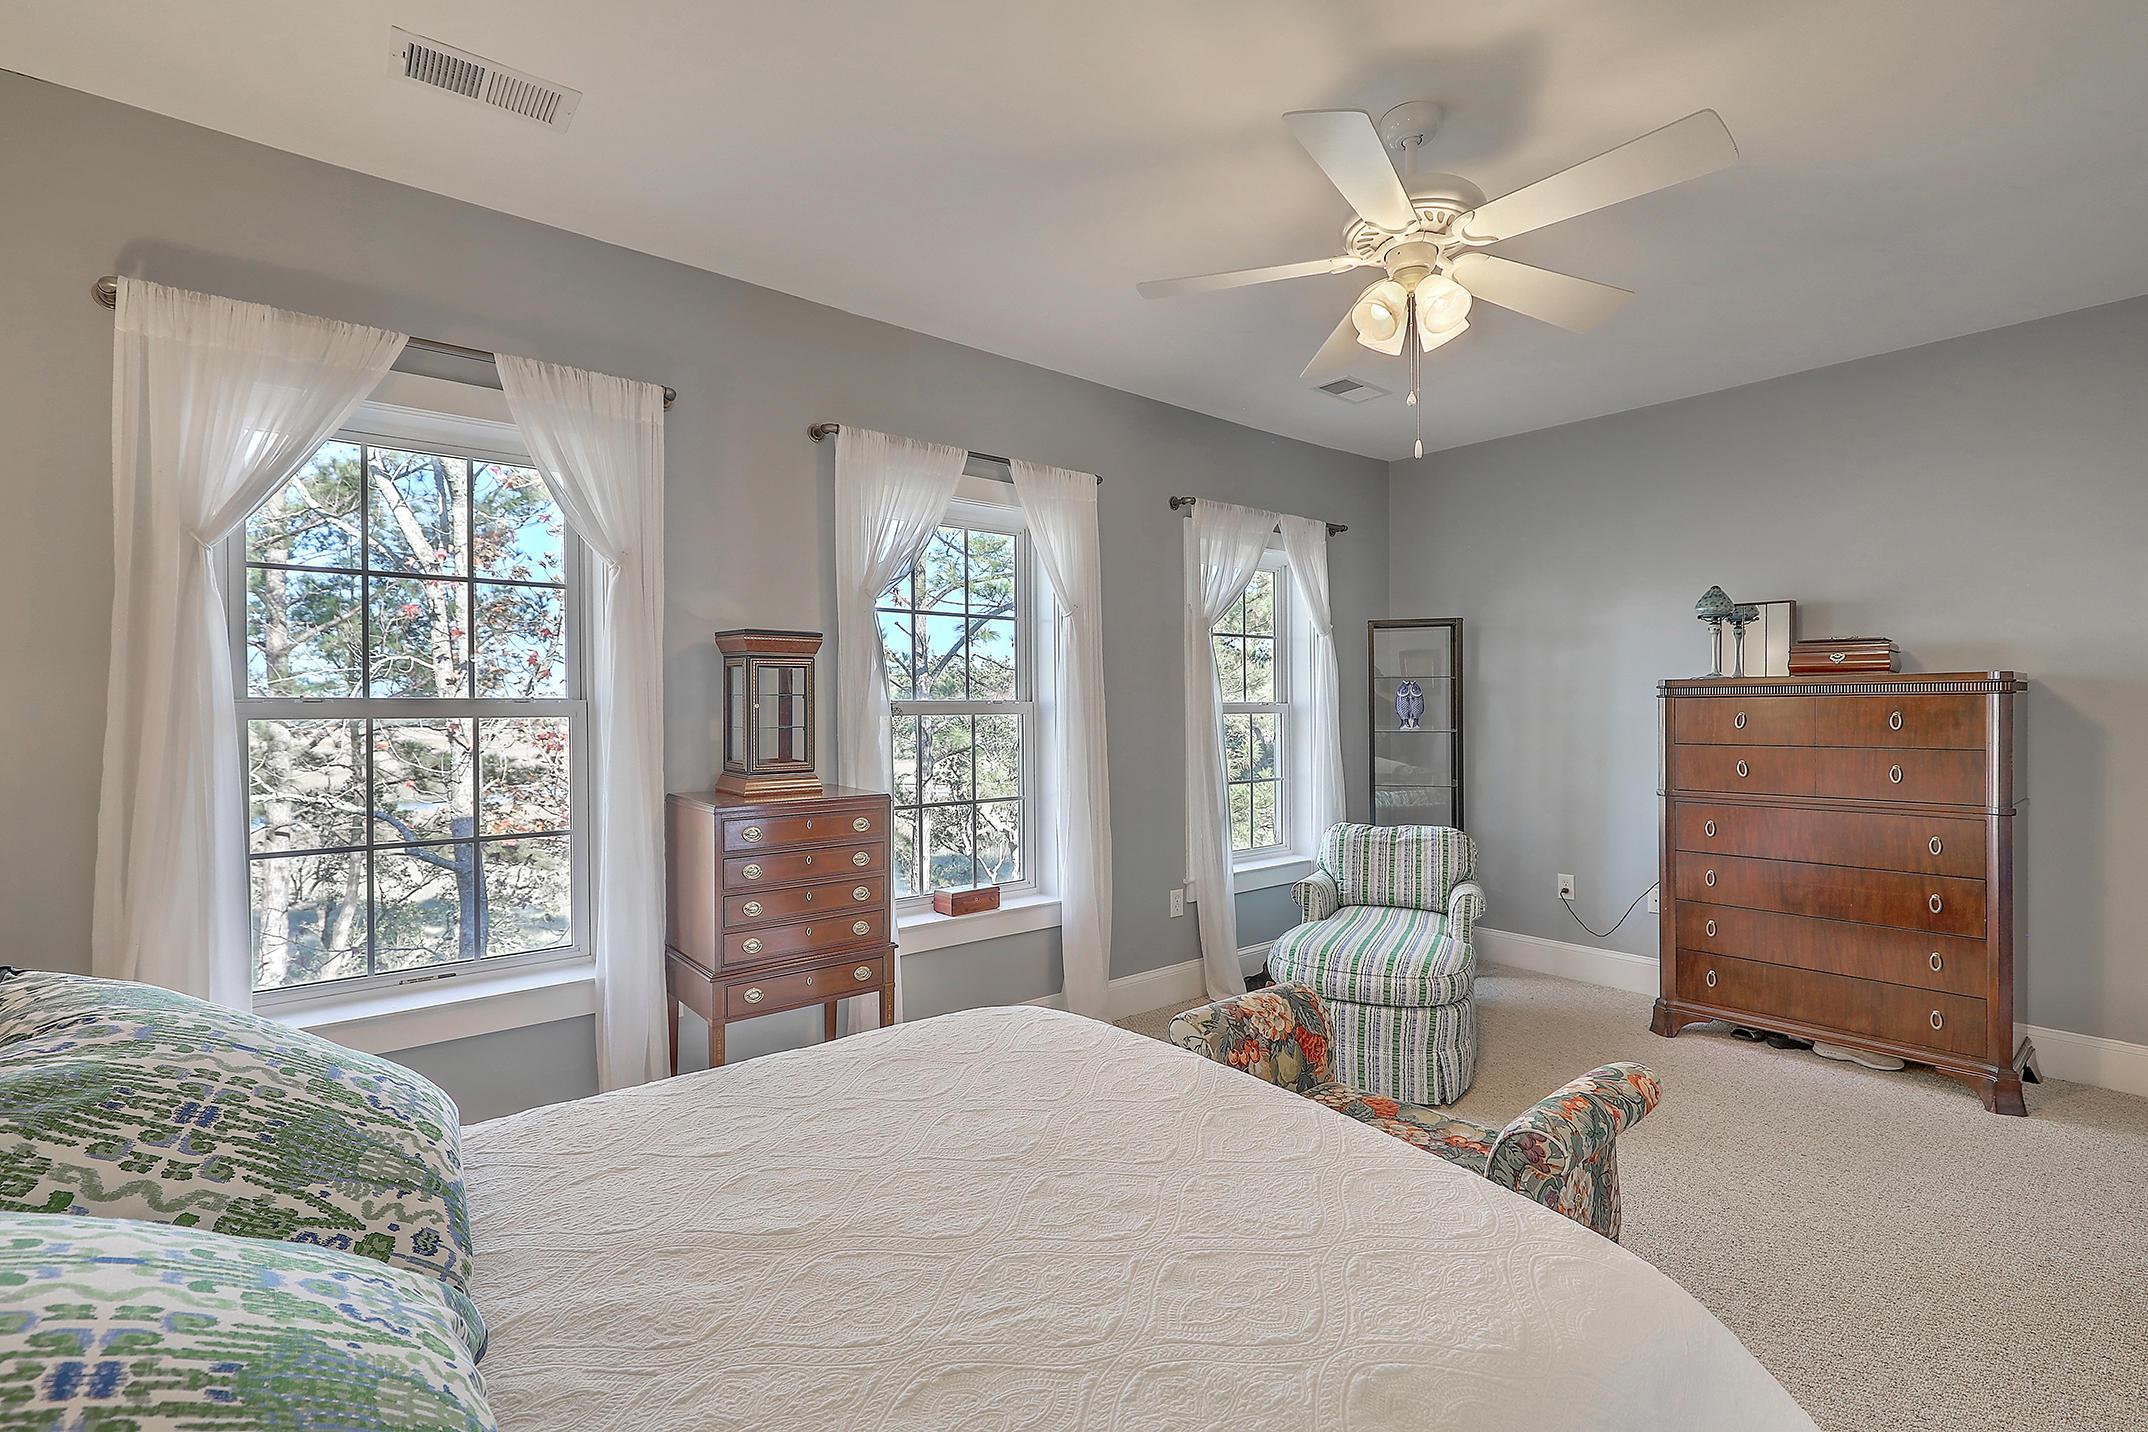 Etiwan Pointe Homes For Sale - 124 Winding Creek, Mount Pleasant, SC - 22